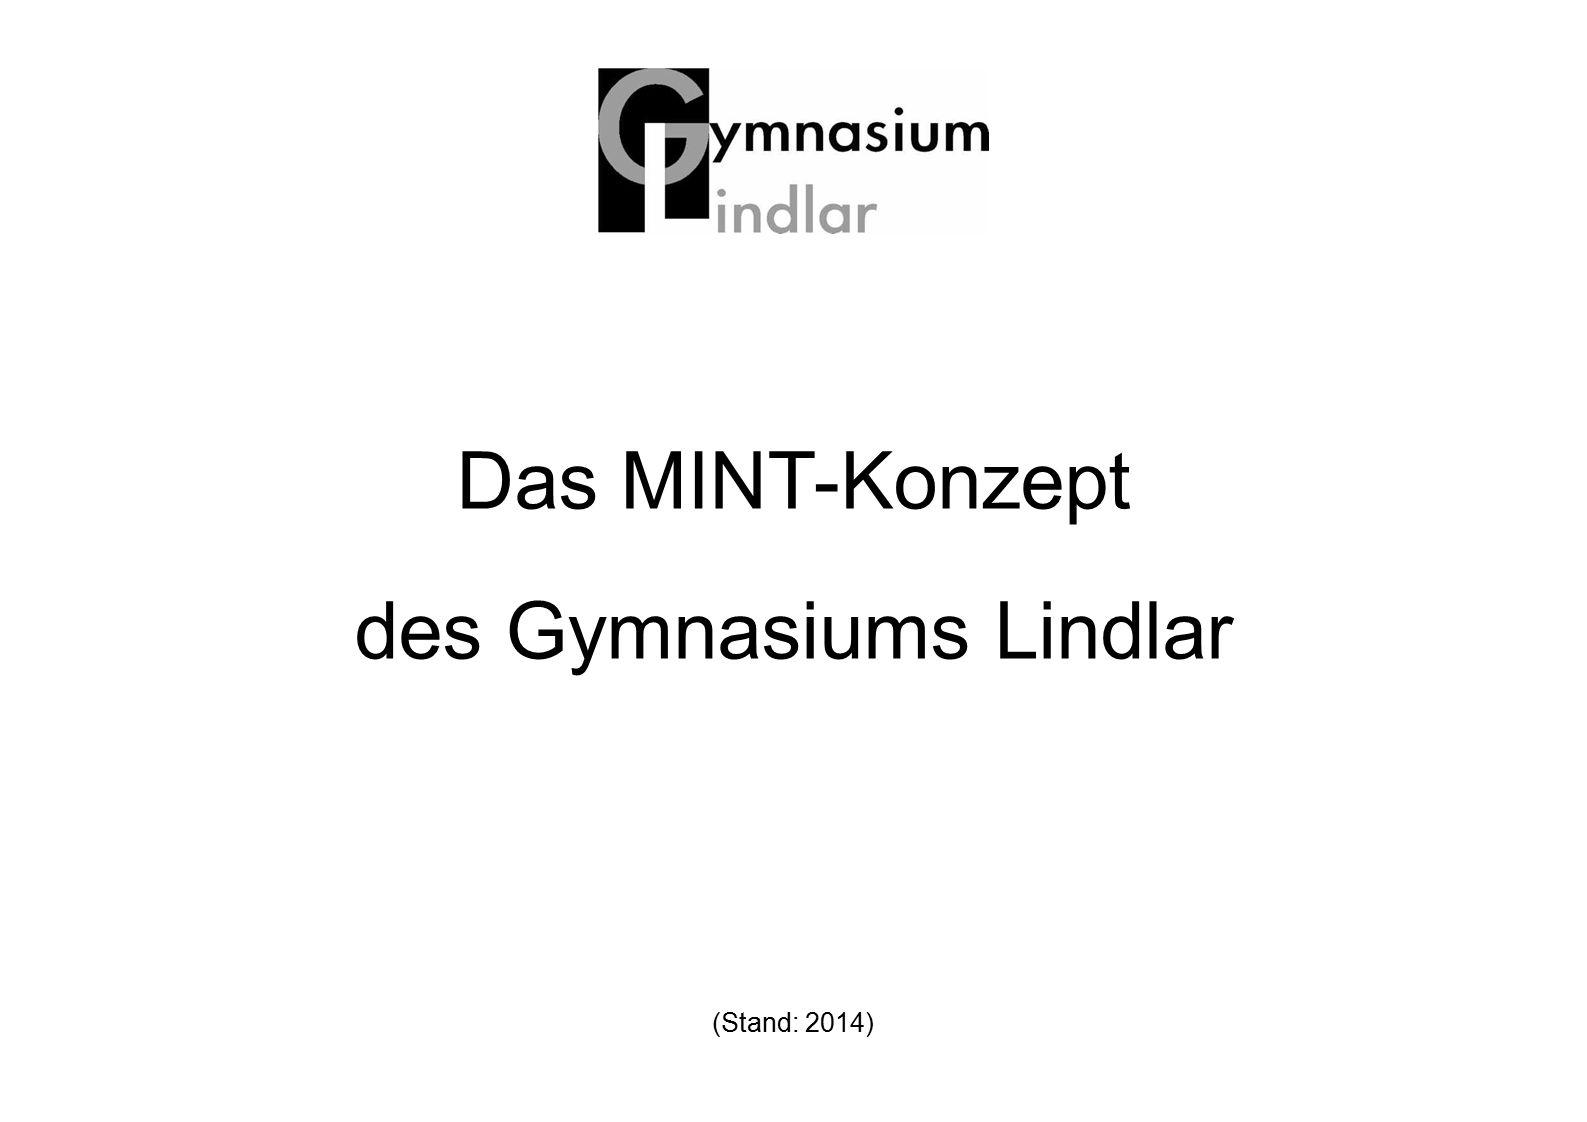 Das MINT-Konzept des Gymnasiums Lindlar (Stand: 2014)